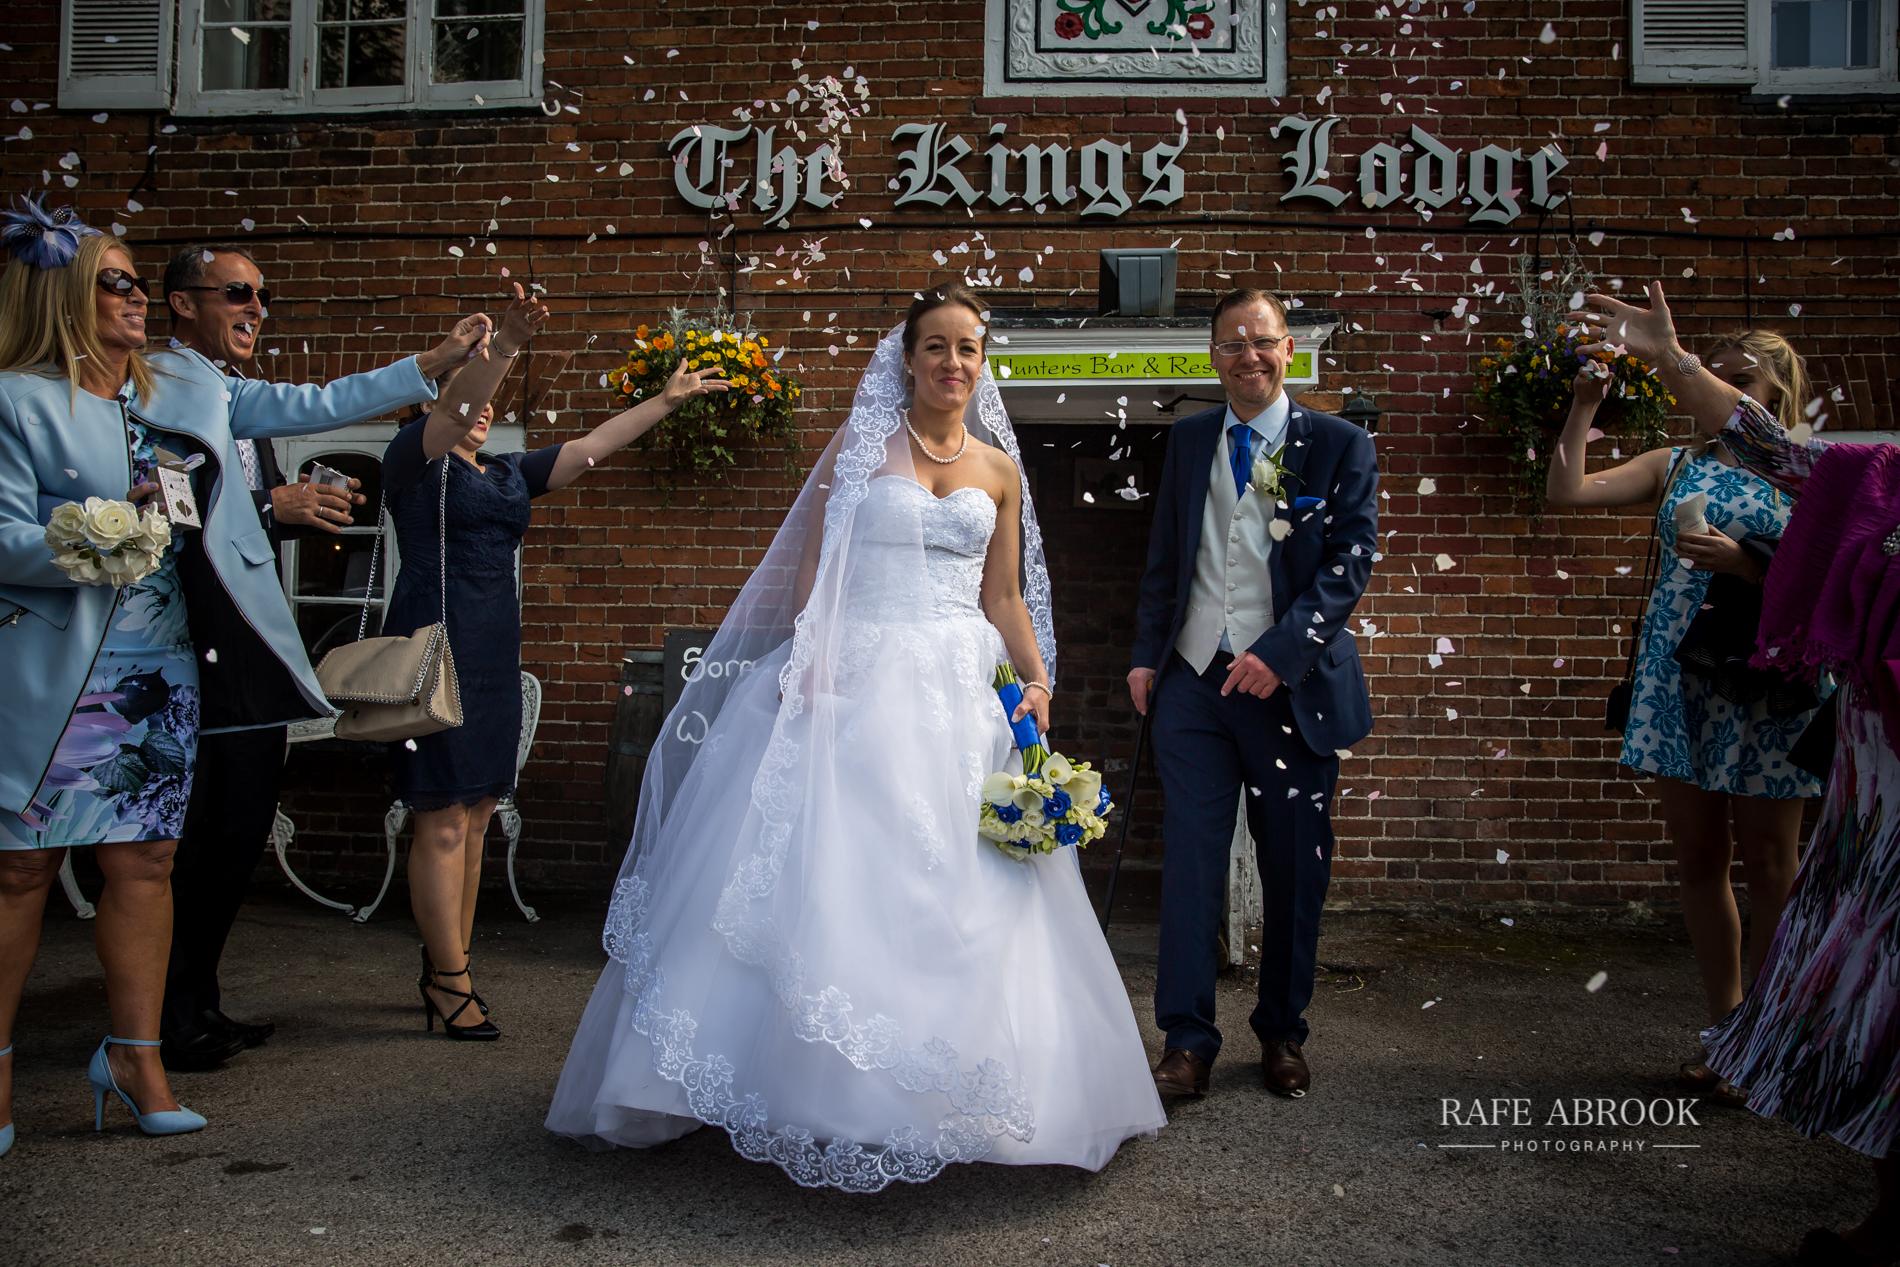 agnes & laurence wedding kings lodge hotel kings langley hertfordshire-1213.jpg